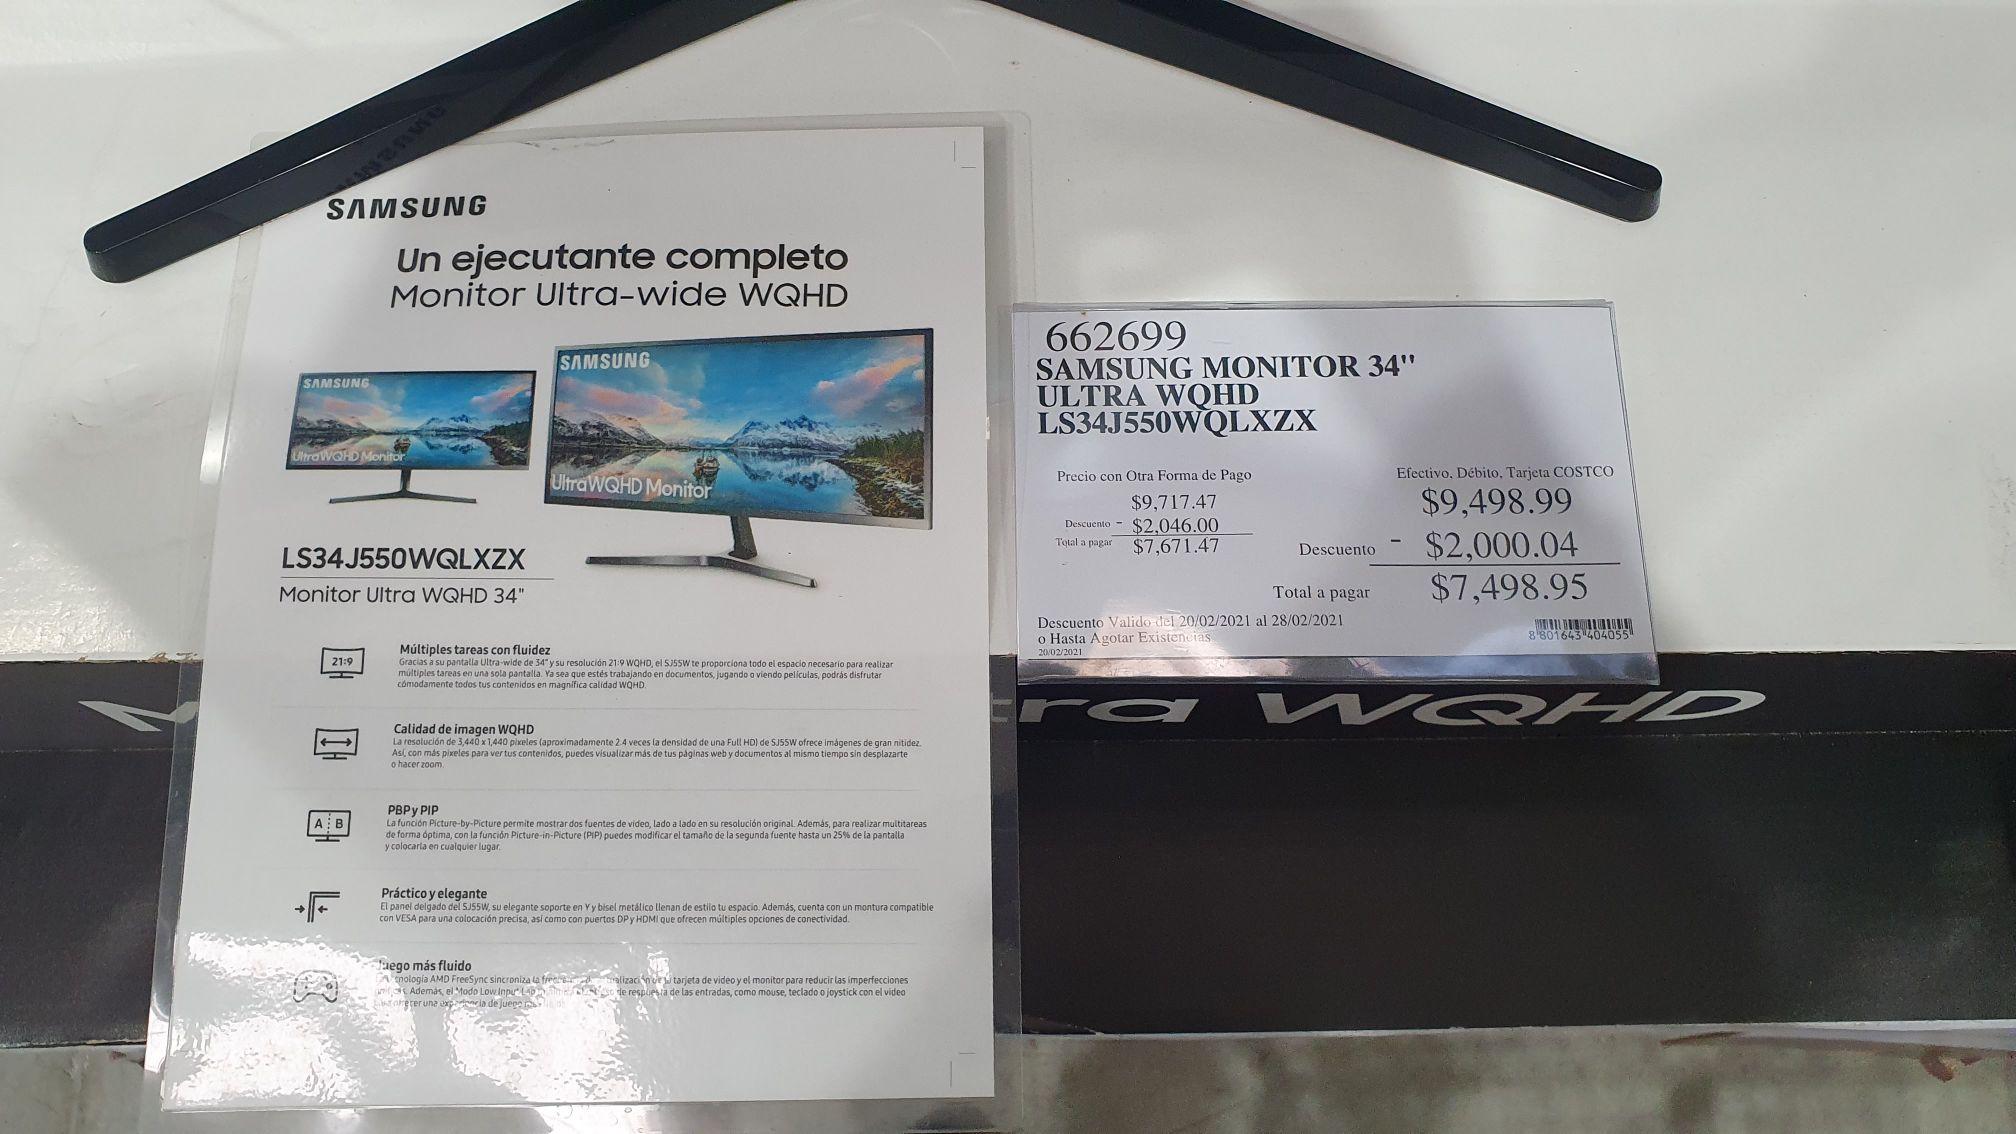 "Costco - Monitor Samsung UltraWQHD 34"" modelo LS34J550WQLXZX"